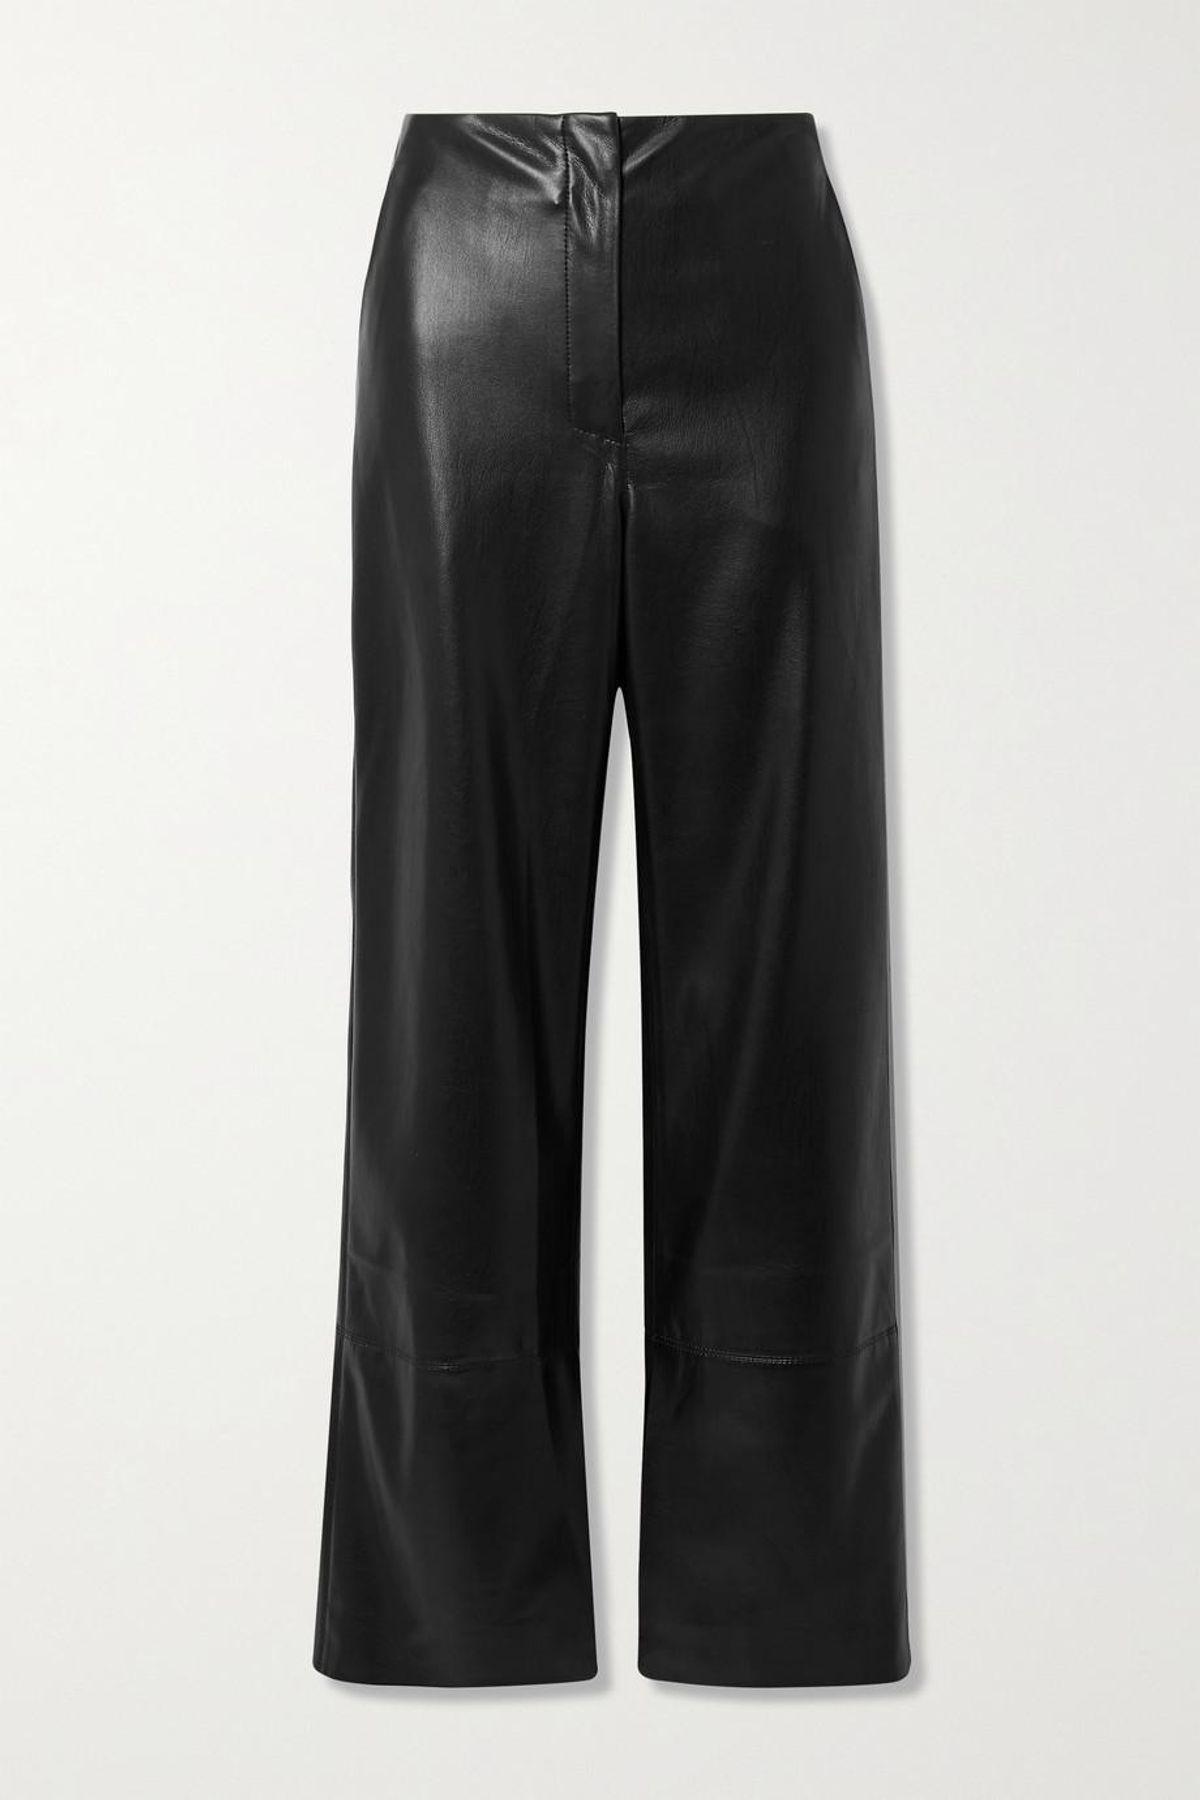 Rhyan Vegan Leather Straight Leg Pants